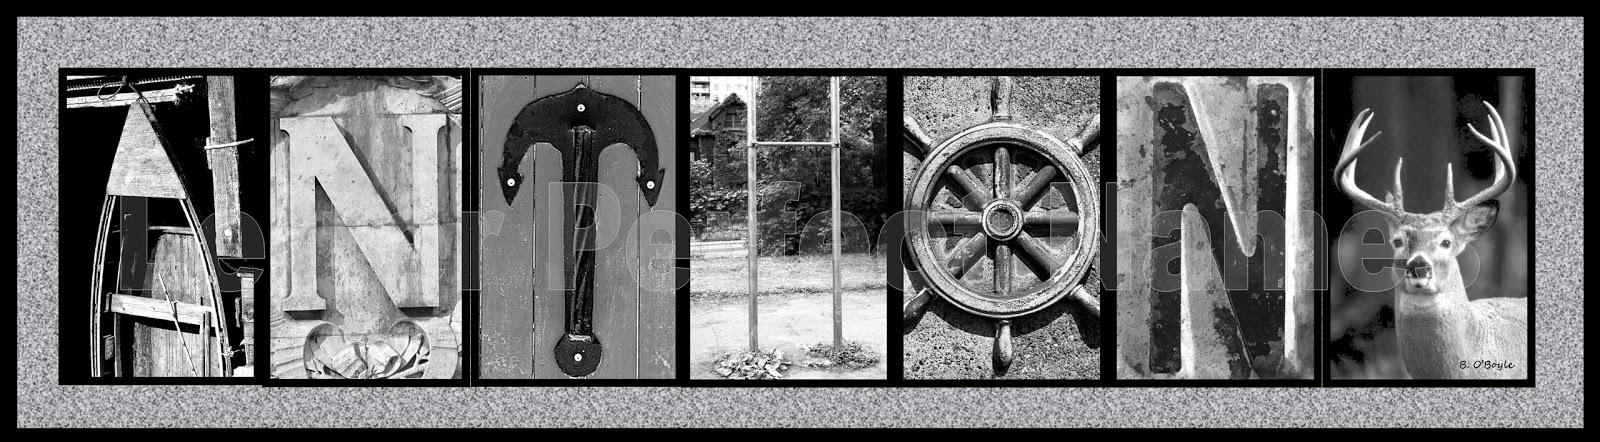 Assignment 3 Alphabet Photography Anthony Prima